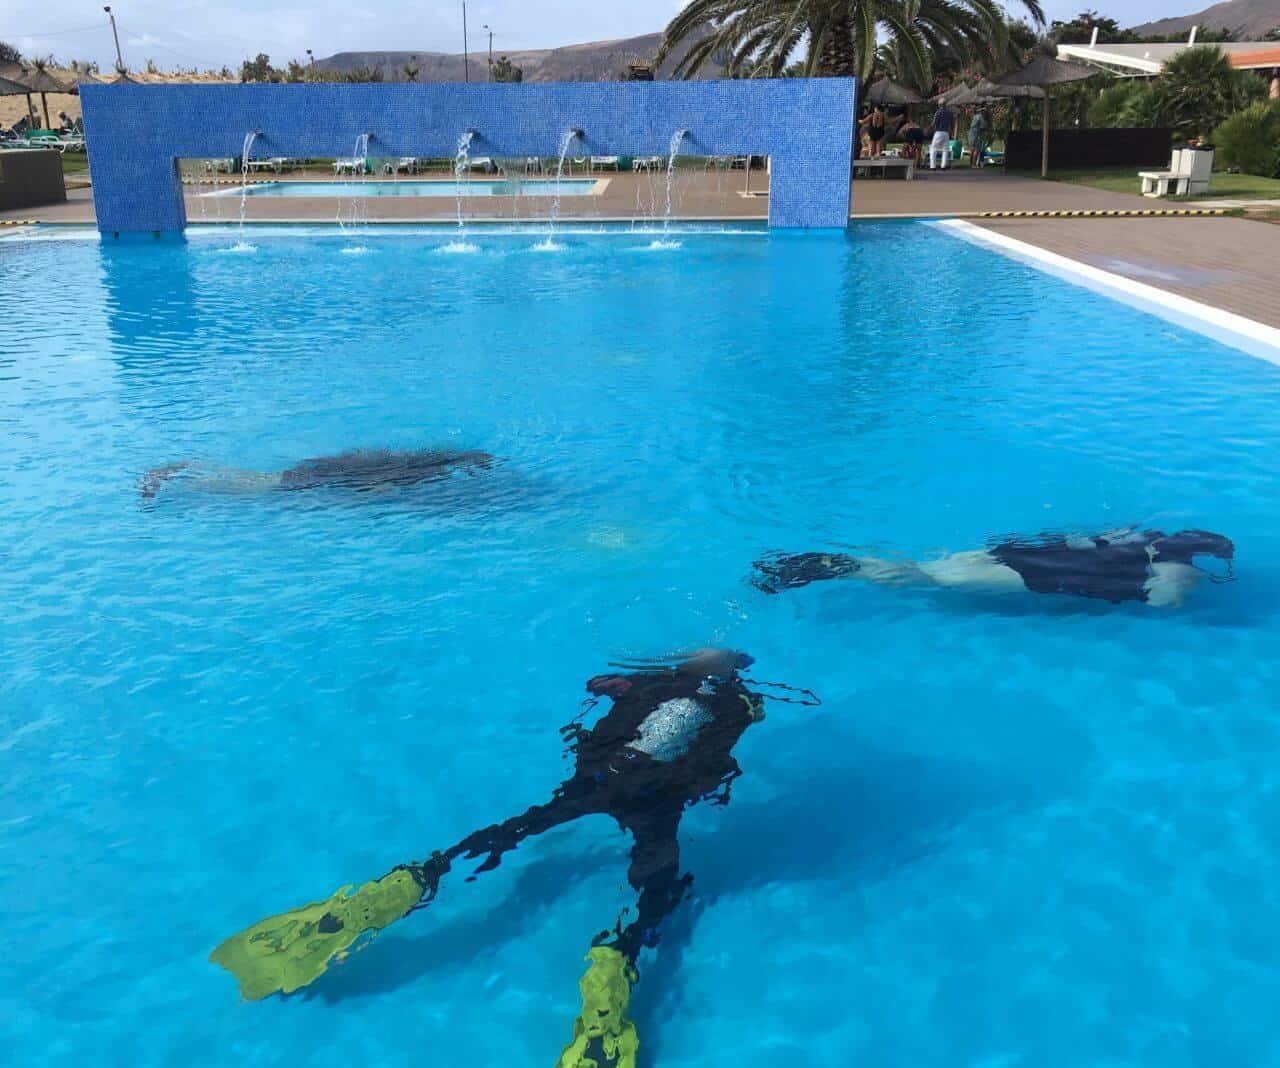 Taucher im Pool